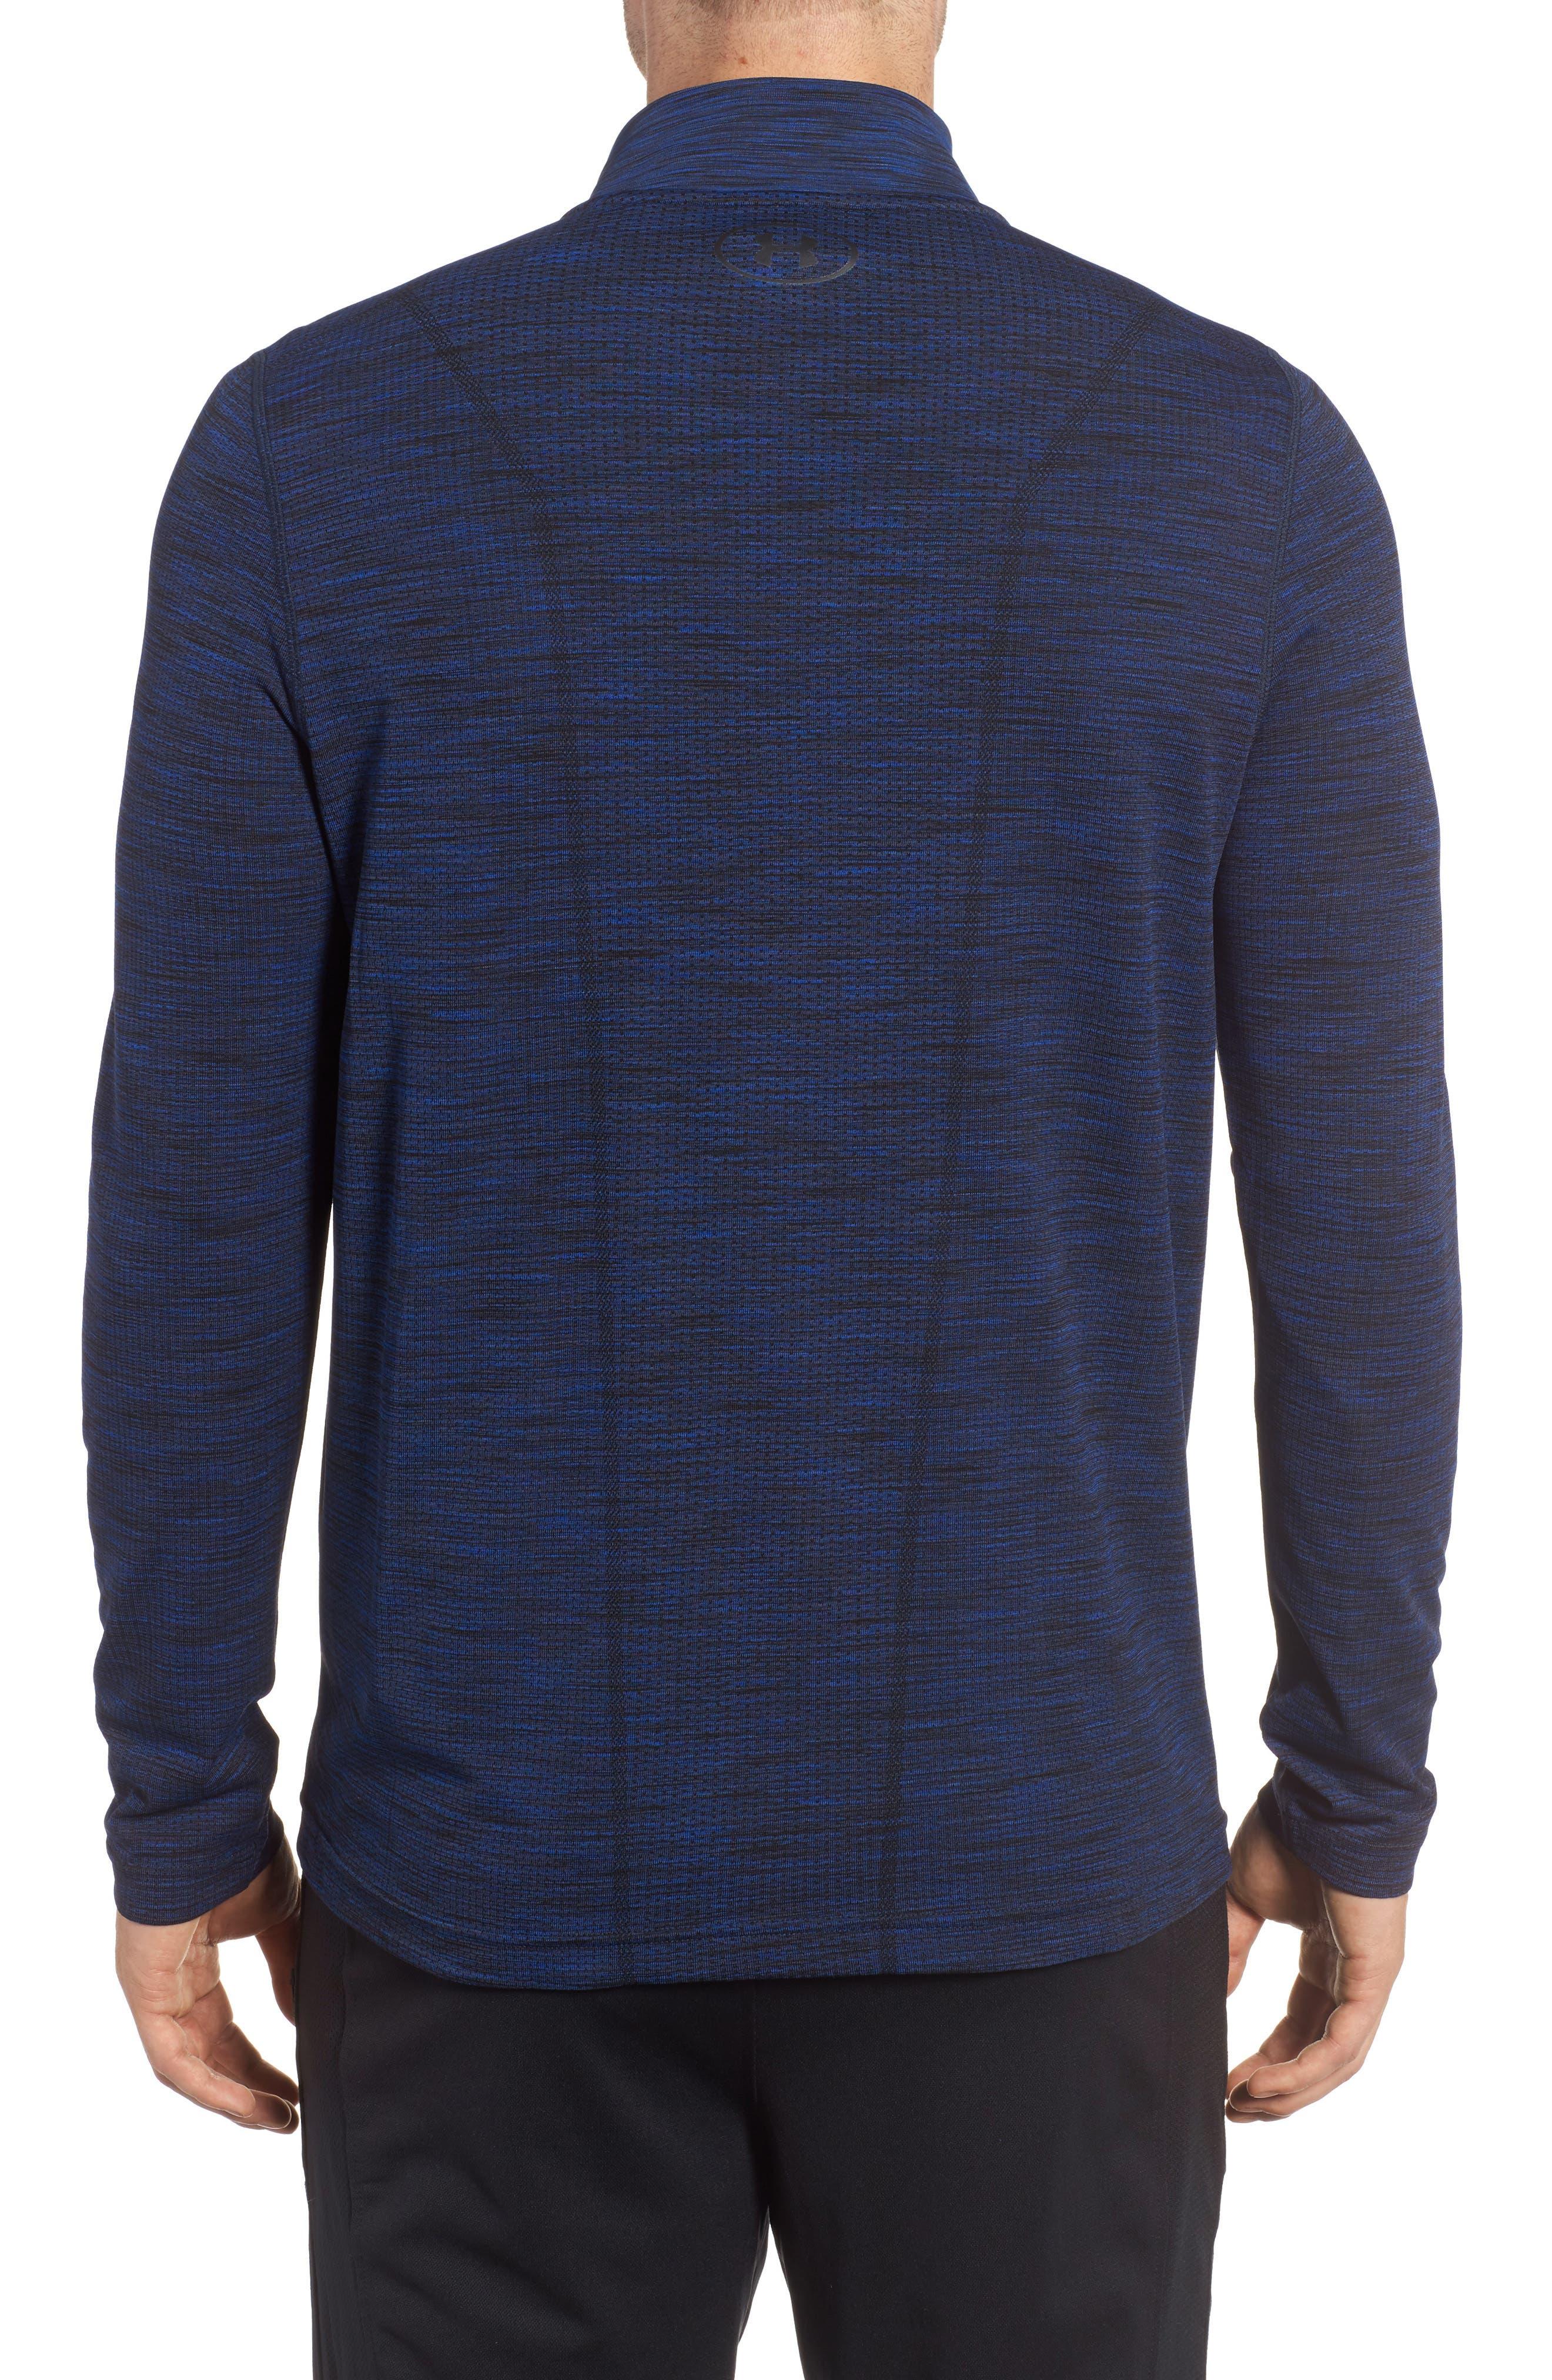 Threadborne Seamless Quarter Zip Pullover,                             Alternate thumbnail 2, color,                             Blue